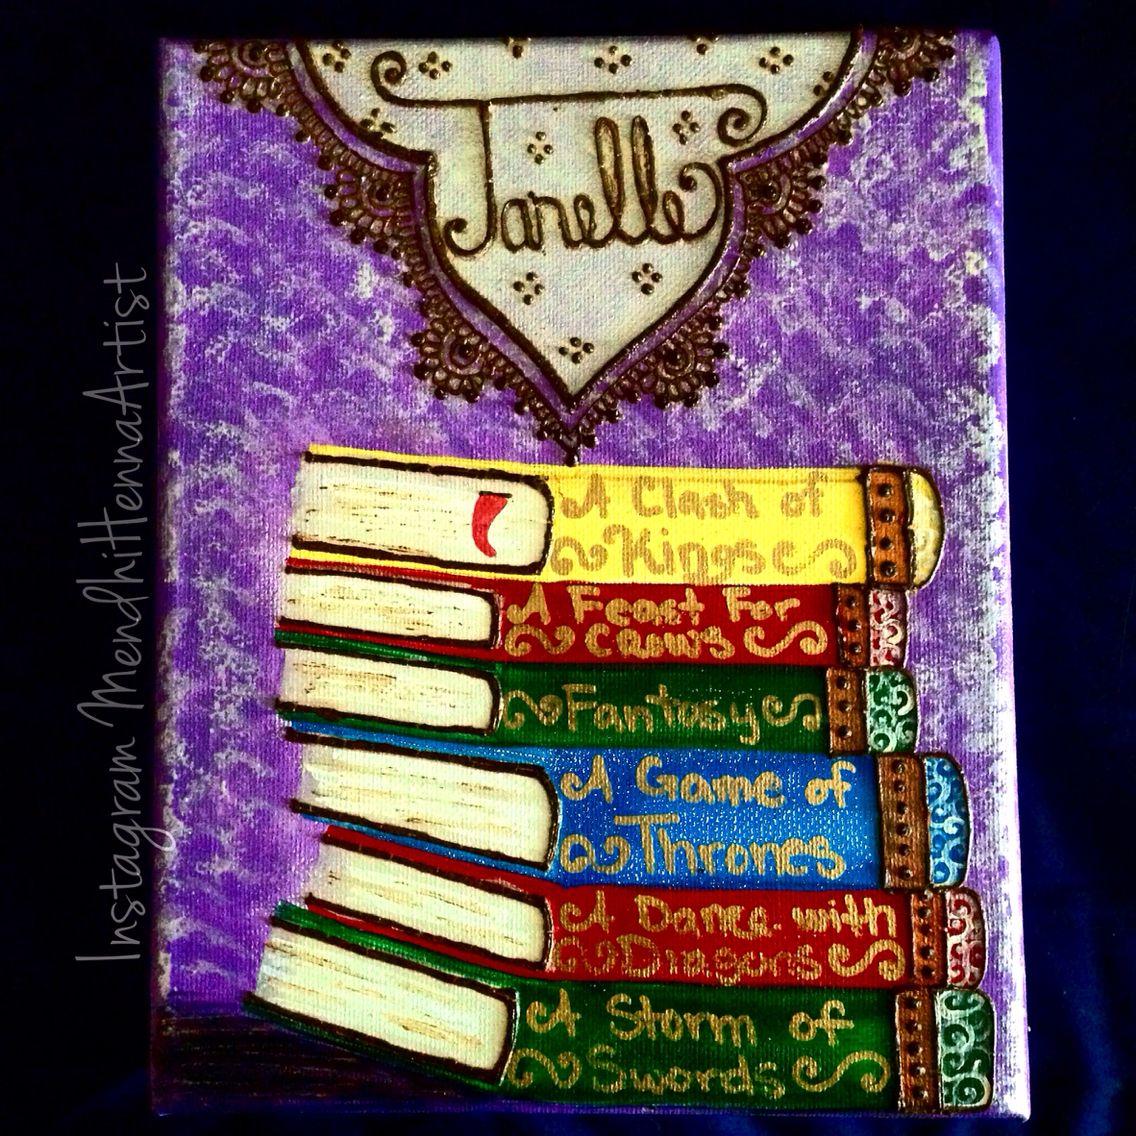 henna canvas wall decor .MendhiHenna.com Instagram MendhiHennaArtist .facebook.com  sc 1 st  Pinterest & henna canvas wall decor www.MendhiHenna.com Instagram ...